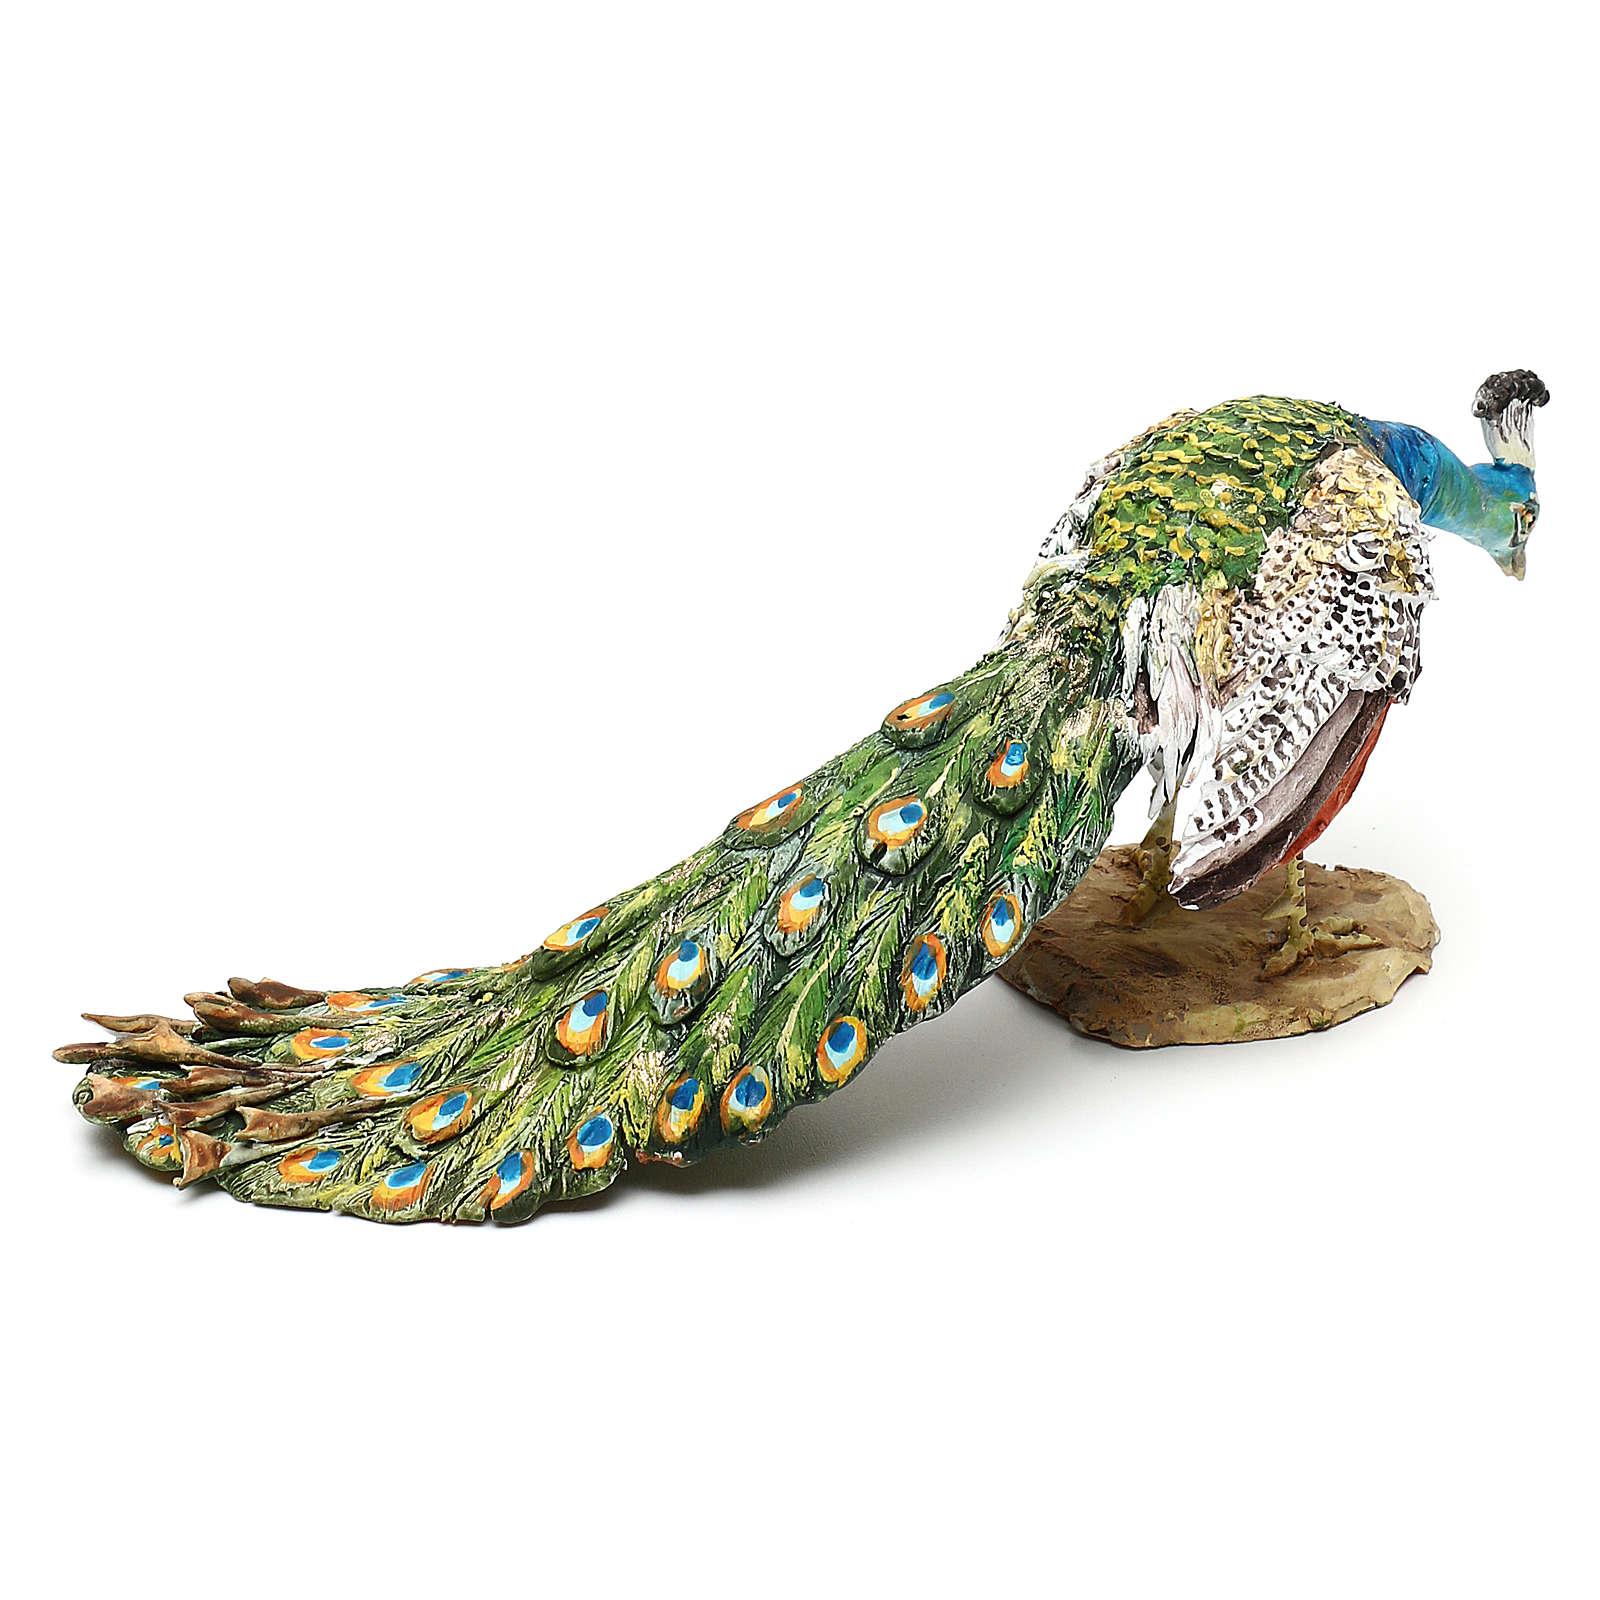 Nativity scene peacock, 18 cm by Angela Tripi 4